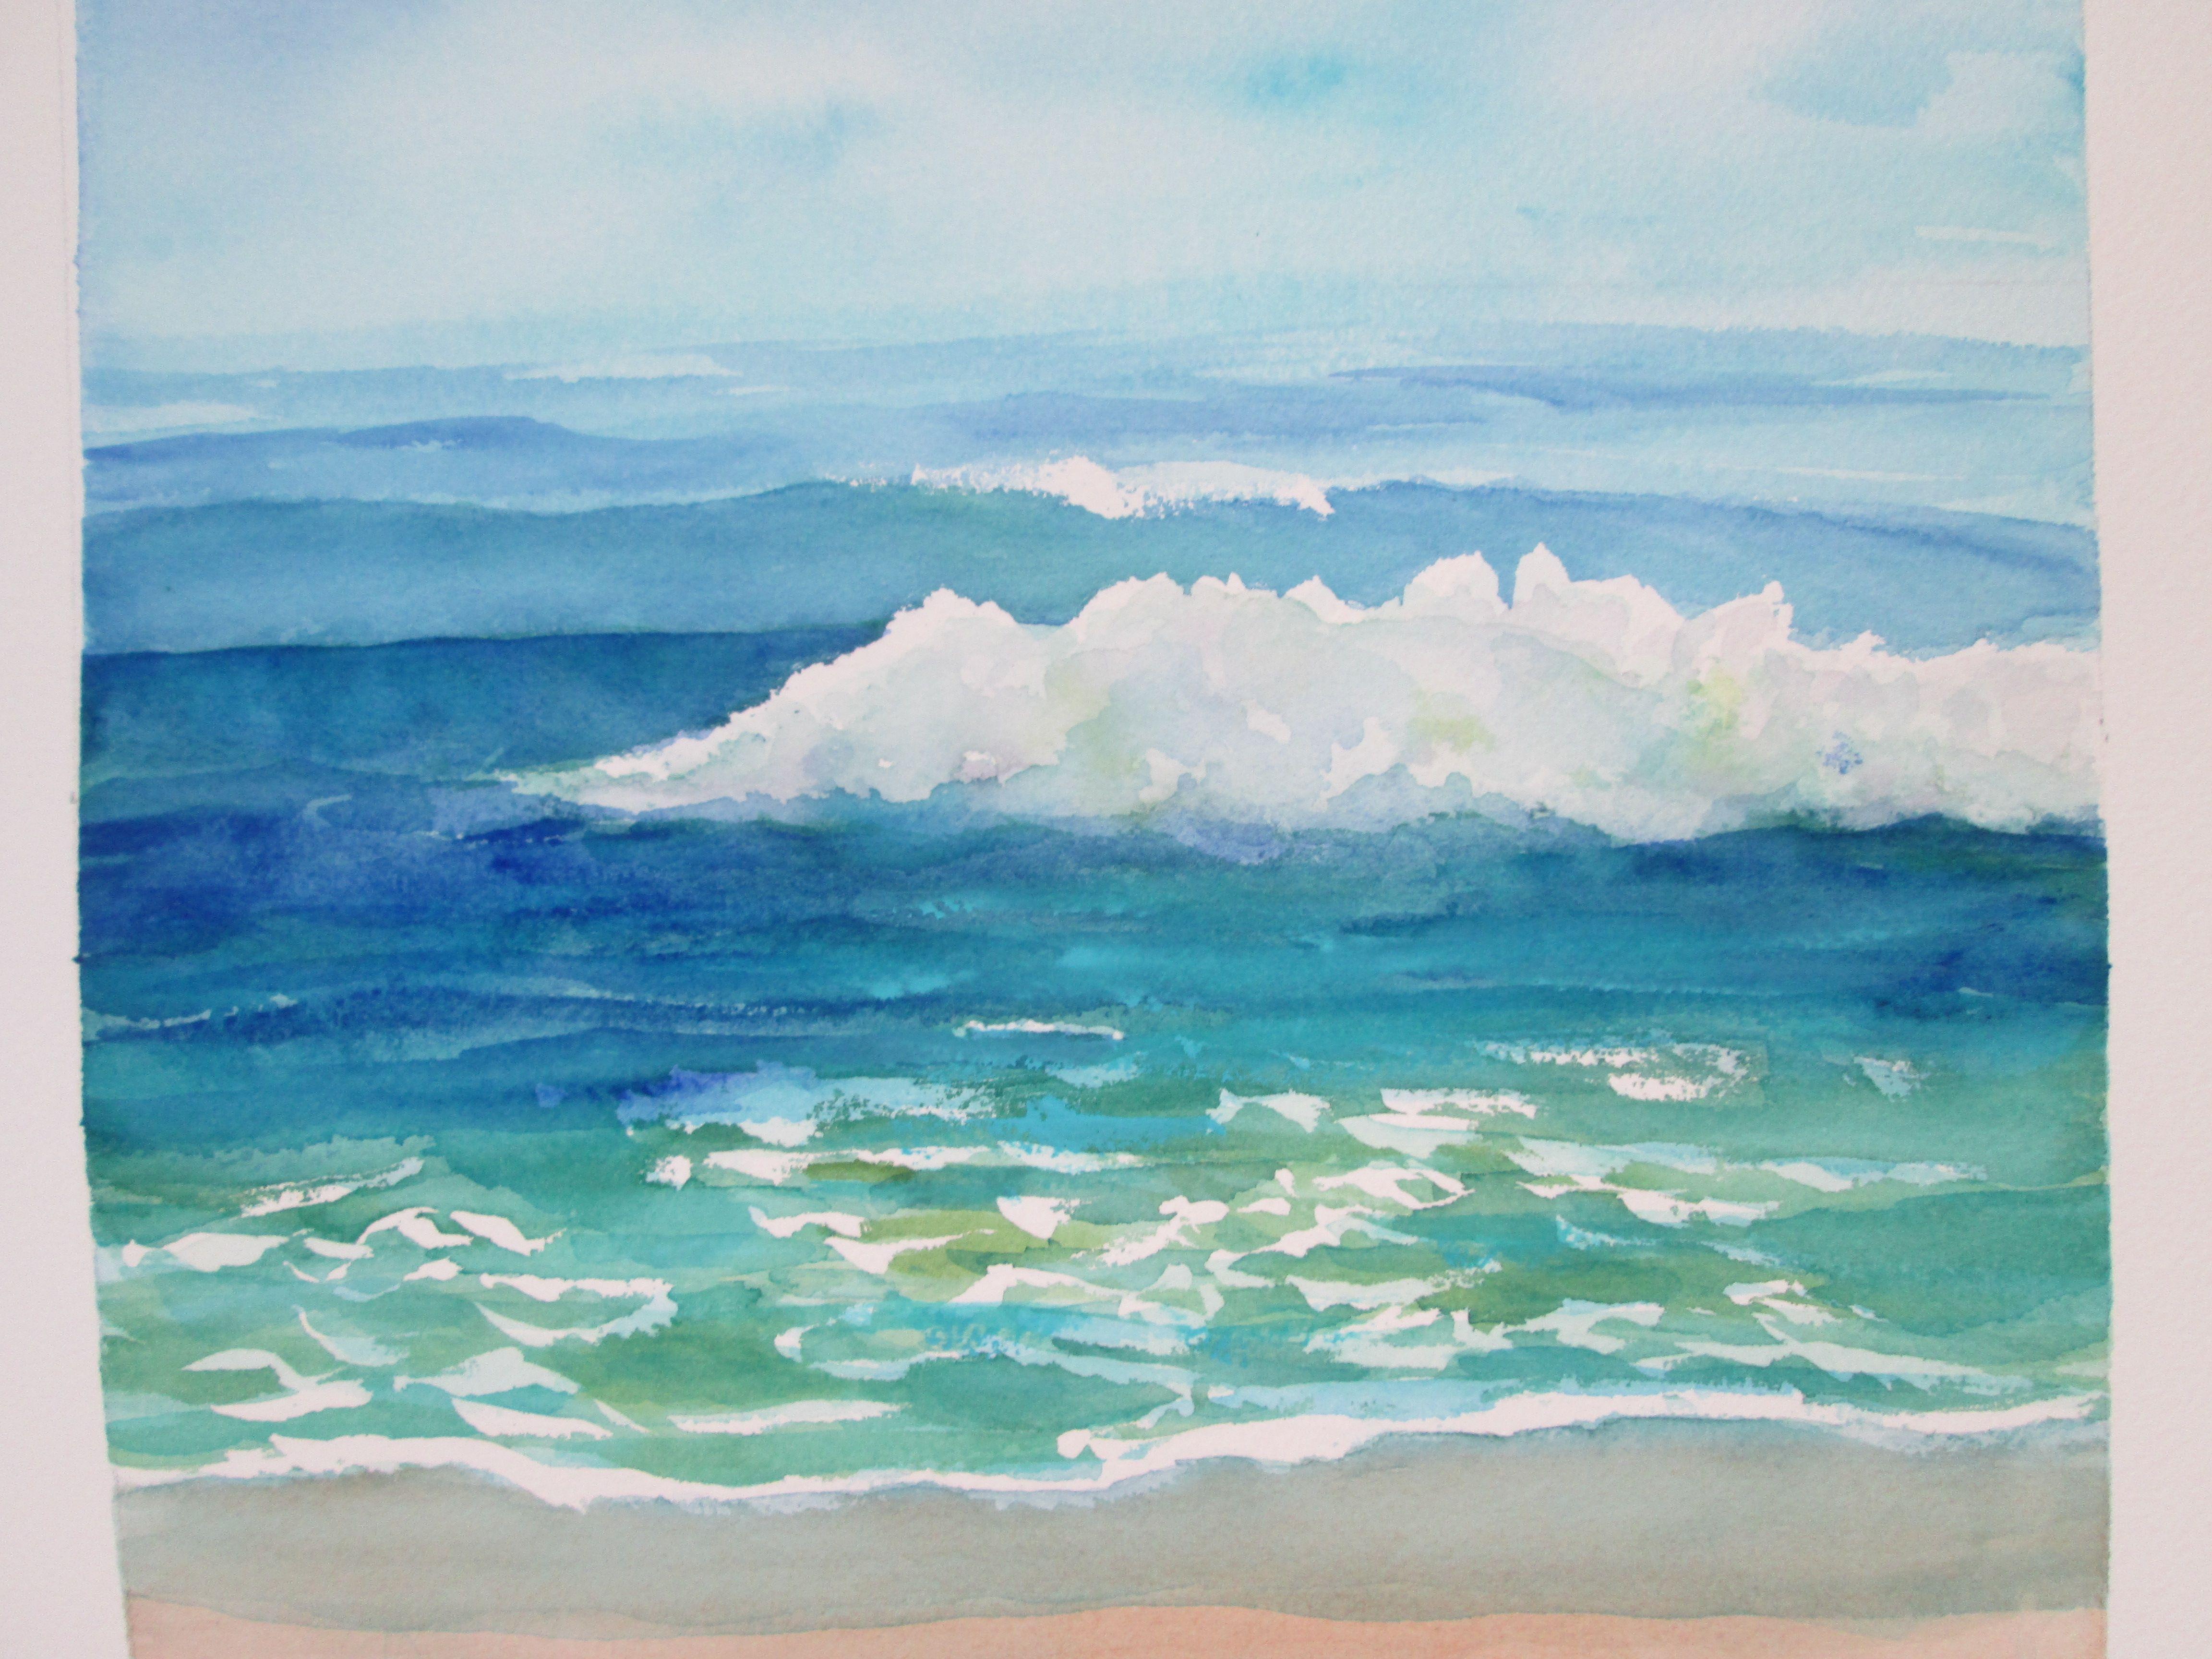 Sea Foam By Michele Mcdonough Ocean Painting Original Watercolors